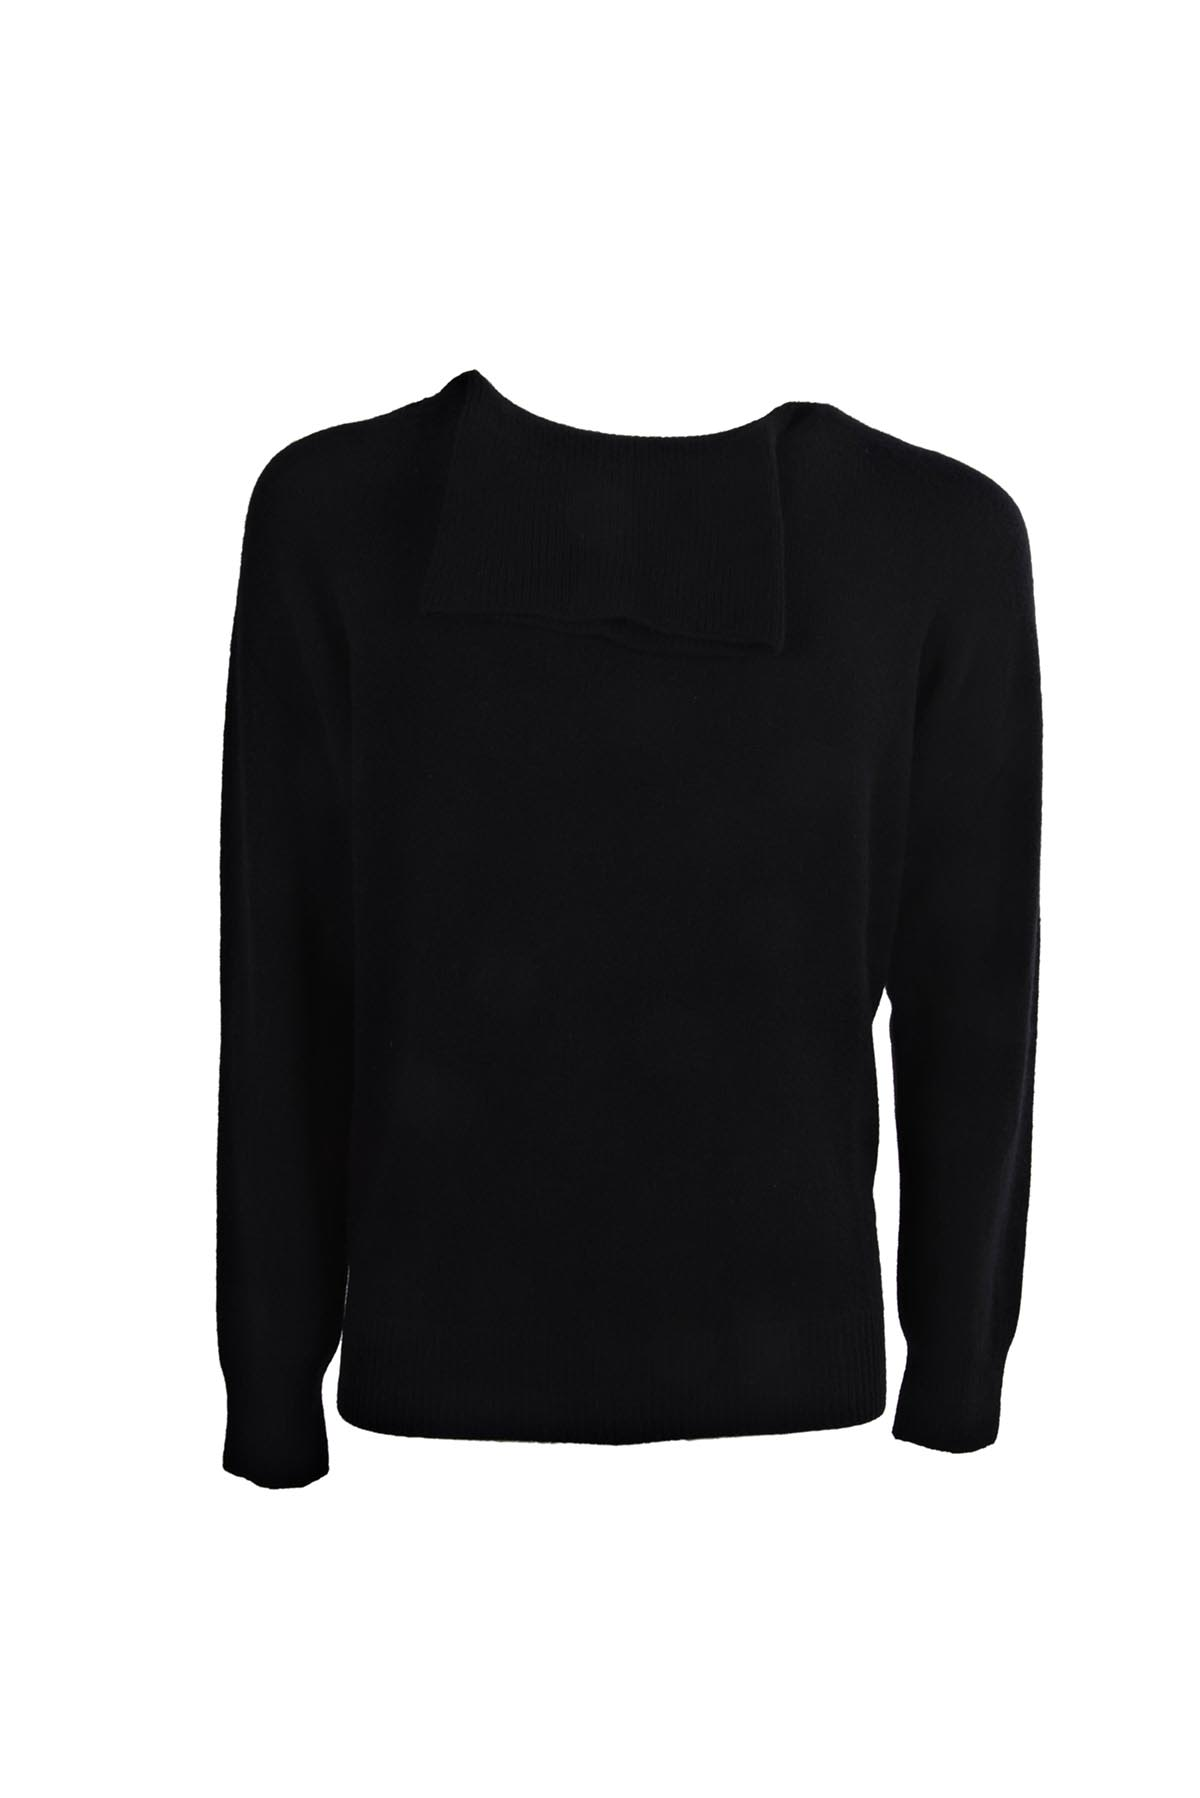 Barena Turtle Neck Sweater